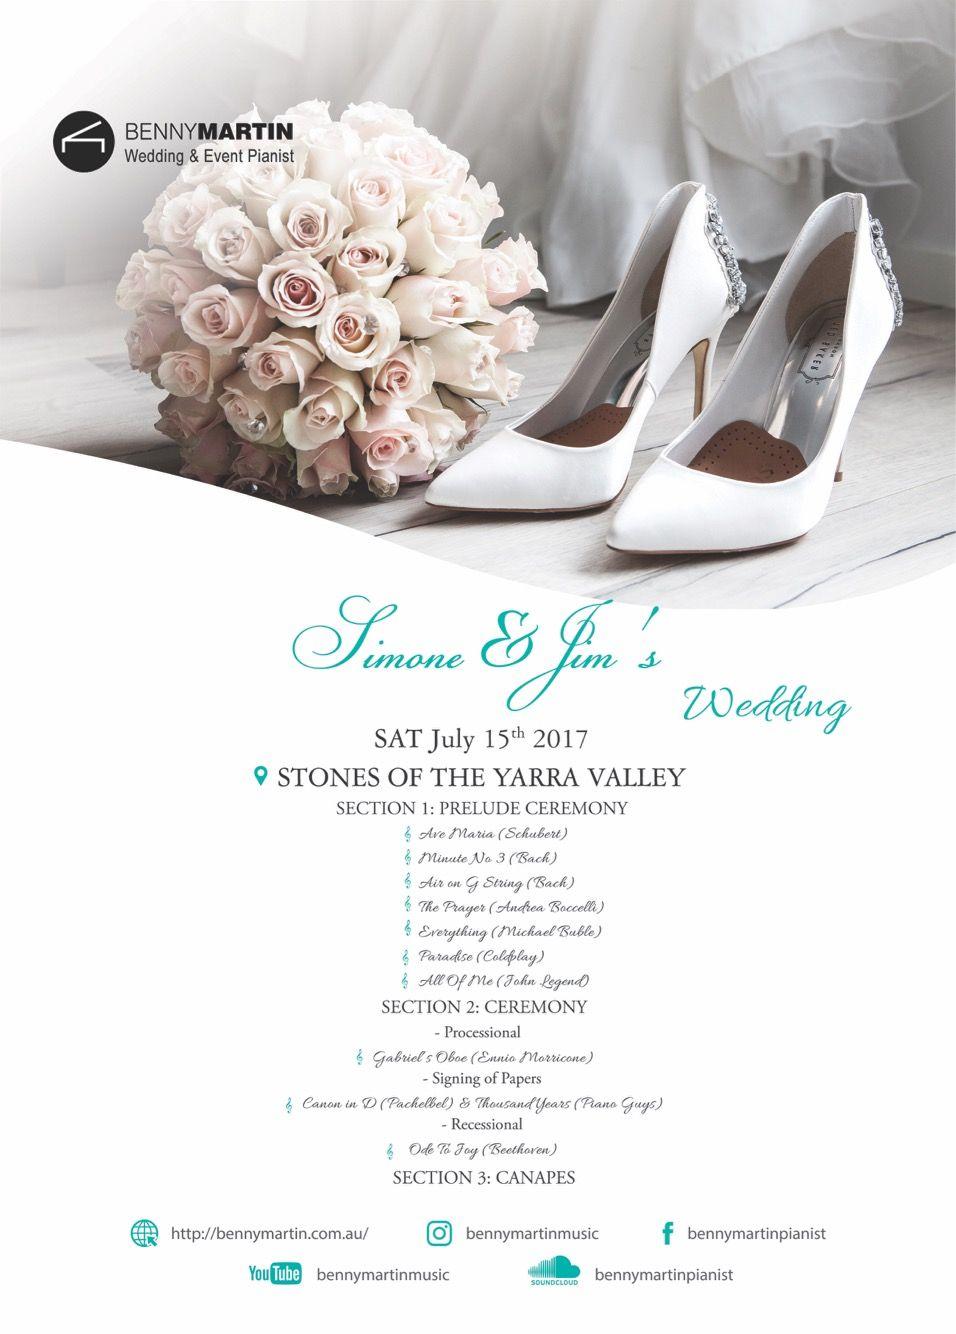 Wedding ceremony set list wedding piano pinterest weddings